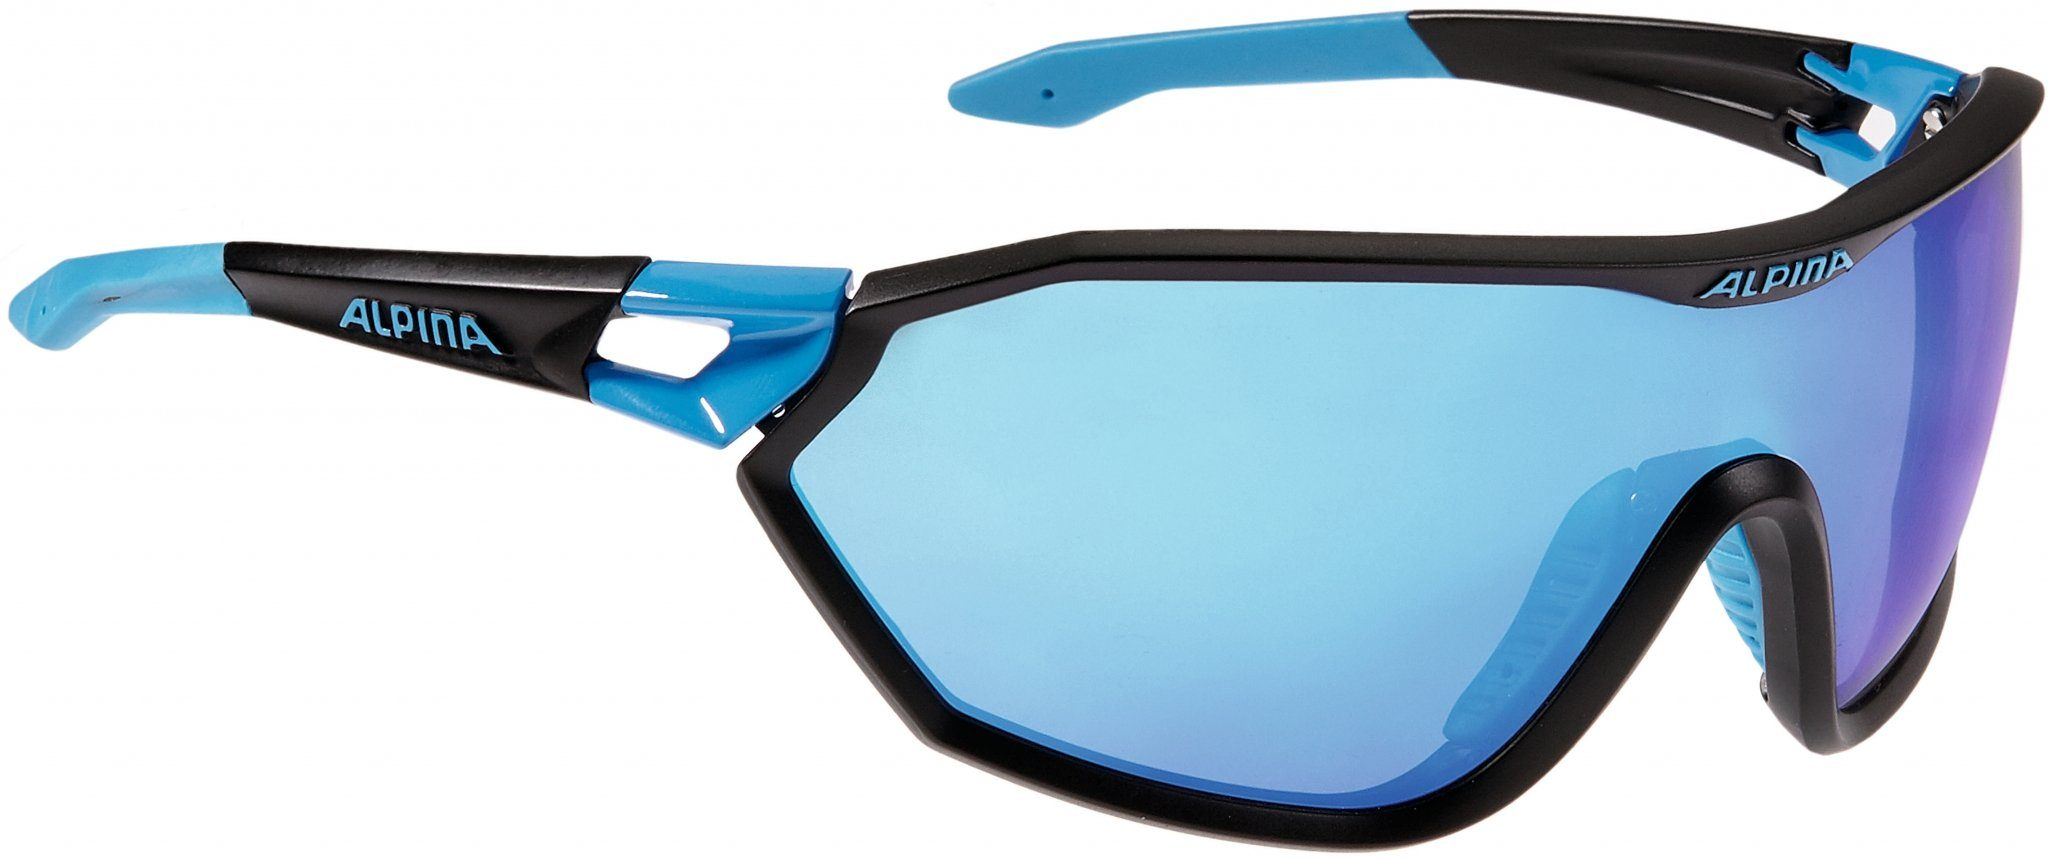 Alpina Radsportbrille »S-Way VLM+«